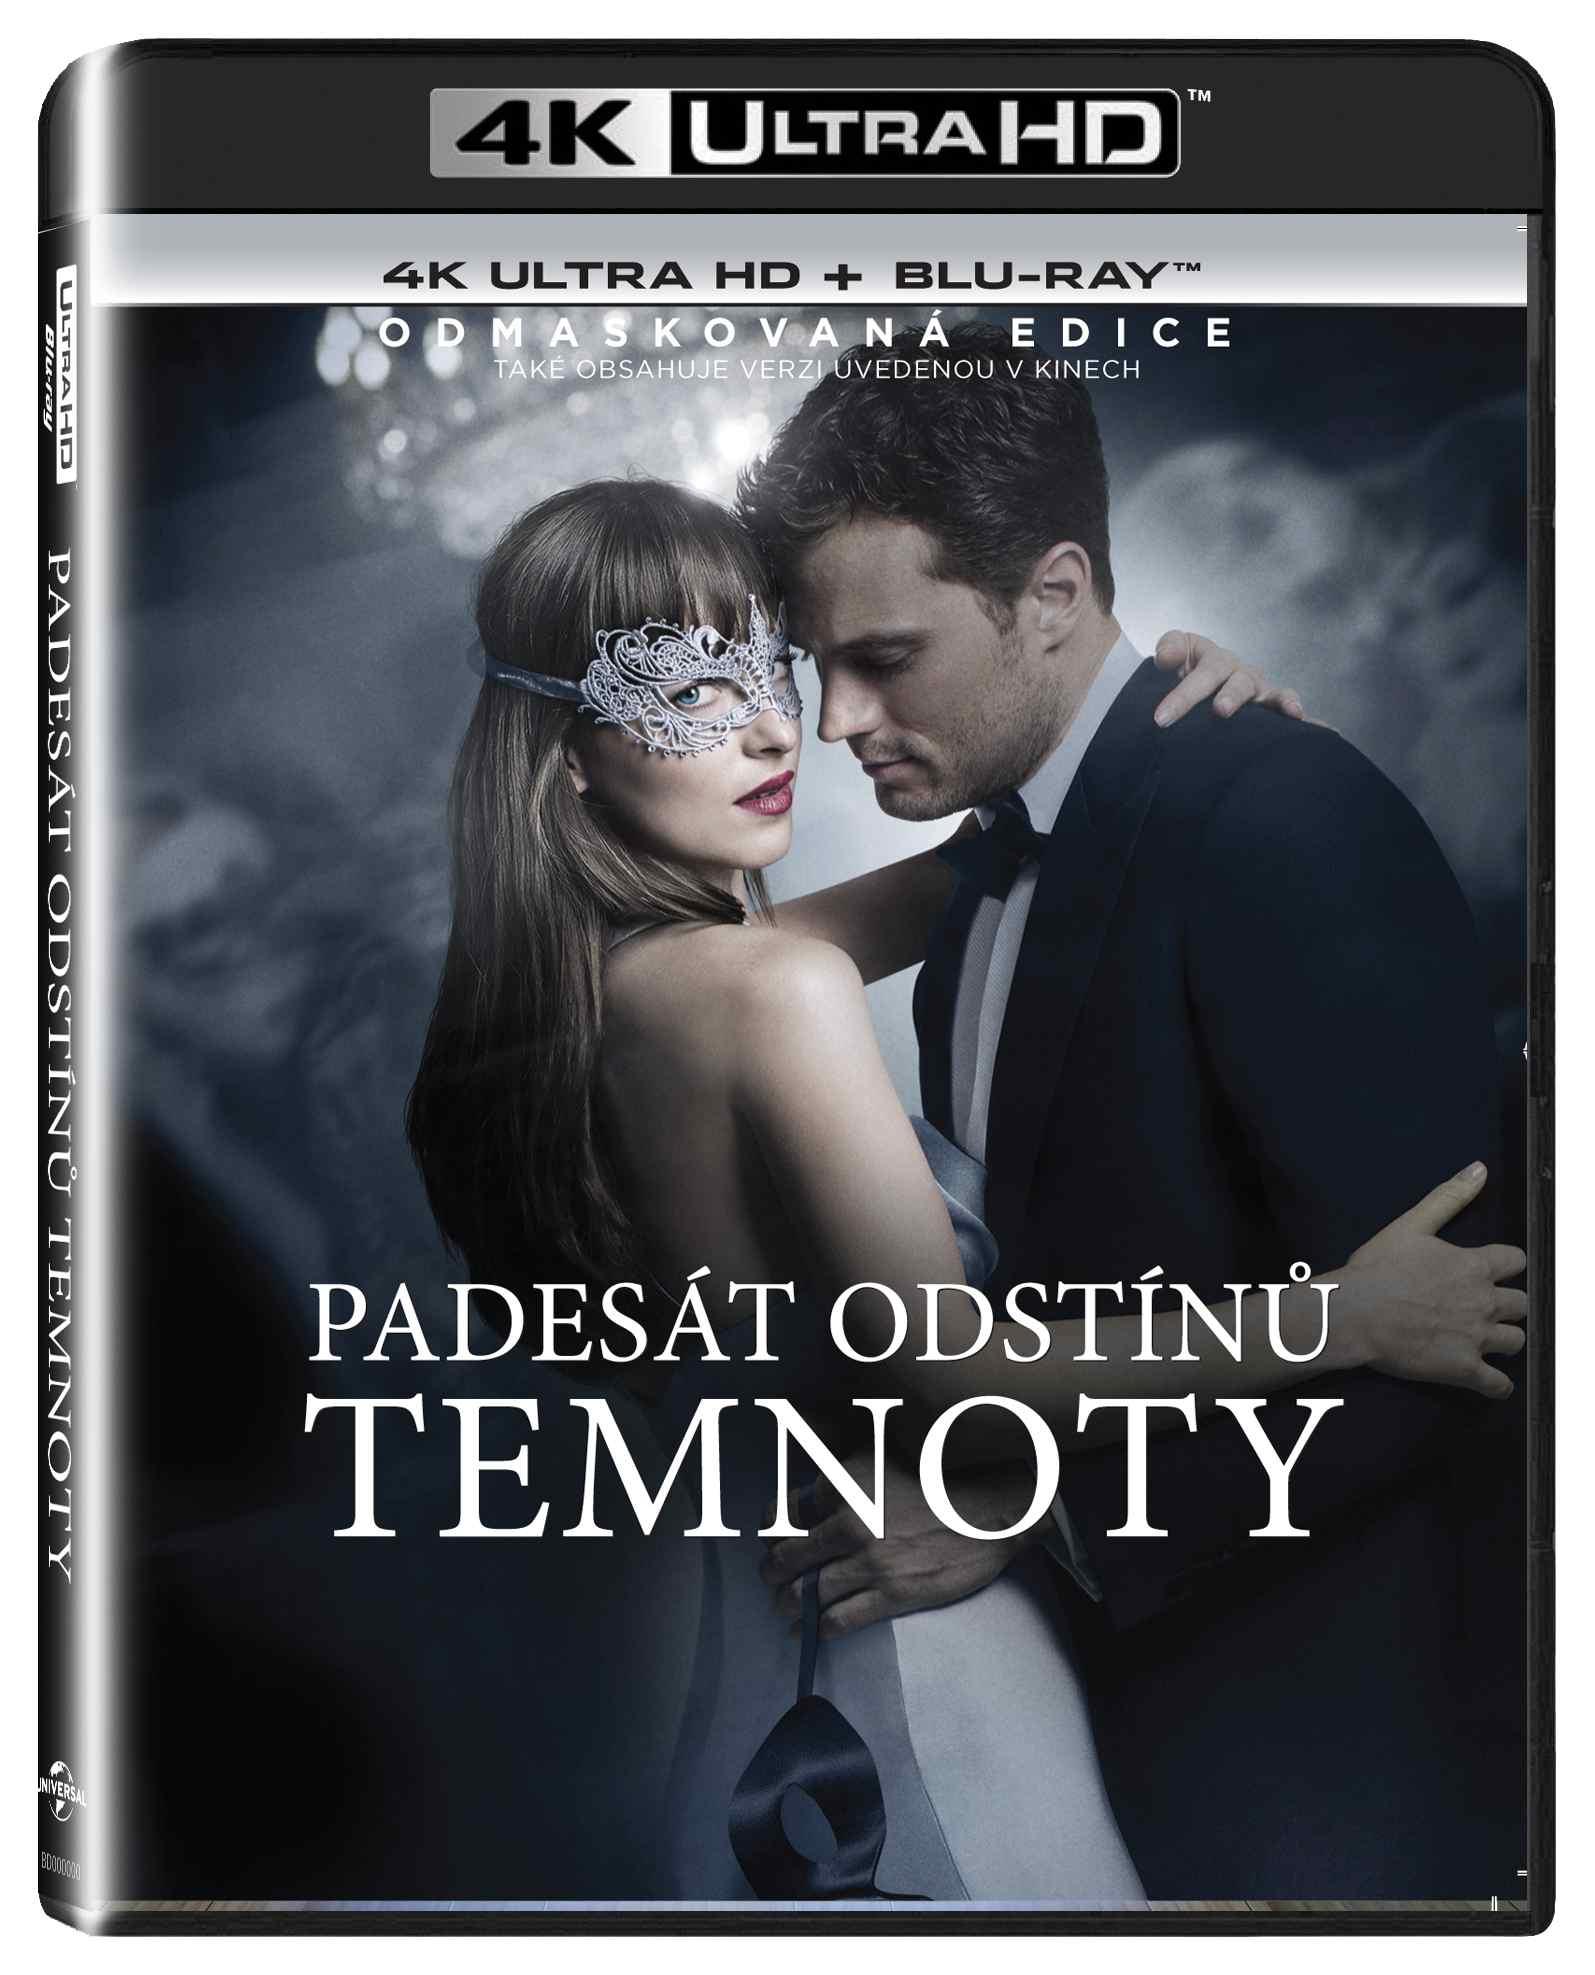 PADESÁT ODSTÍNŮ TEMNOTY (4K ULTRA HD) - UHD Blu-ray + Blu-ray (2 BD)